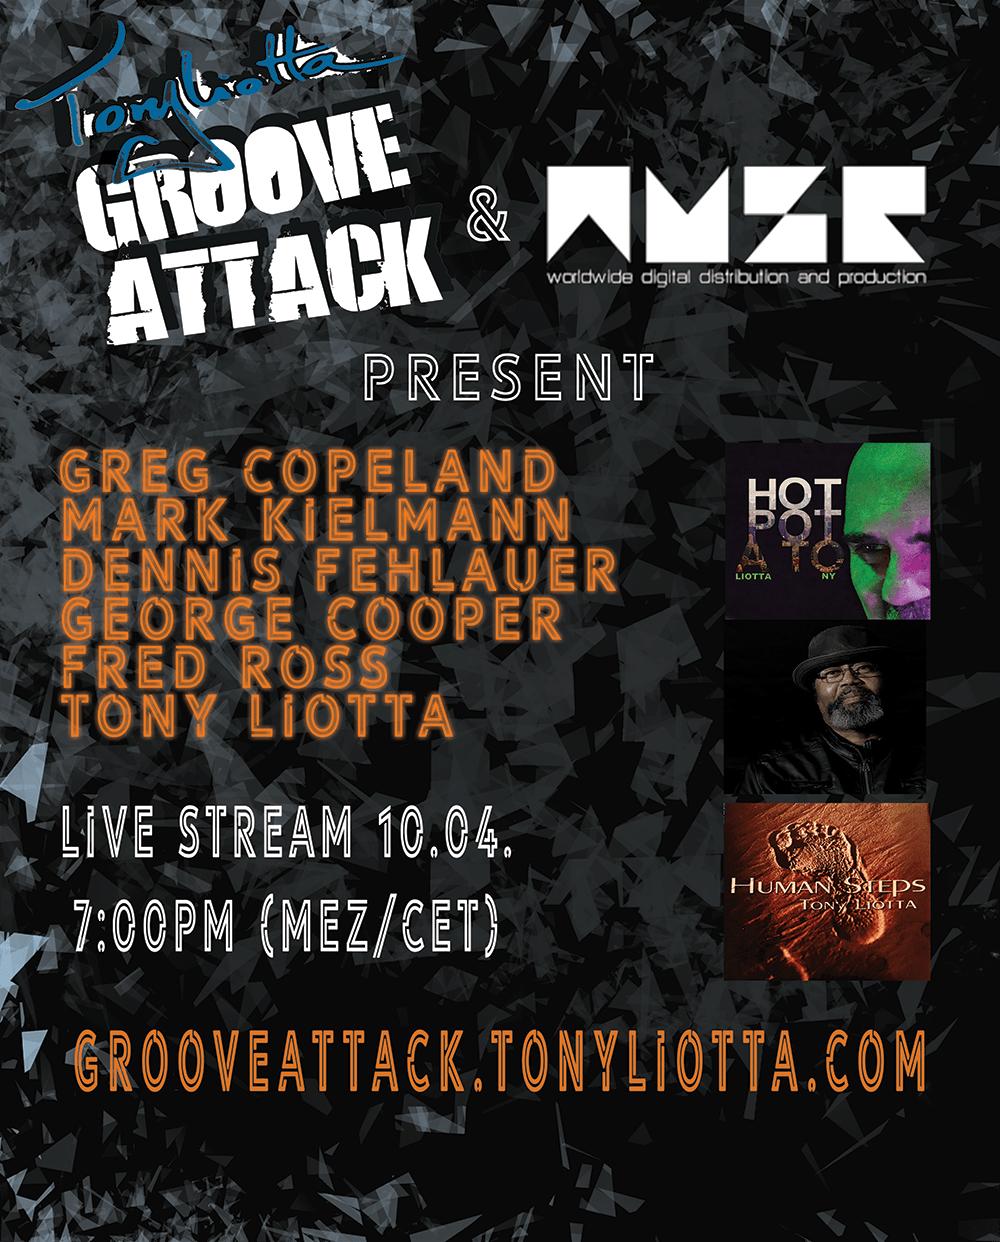 Groove Attack Tony Liotta